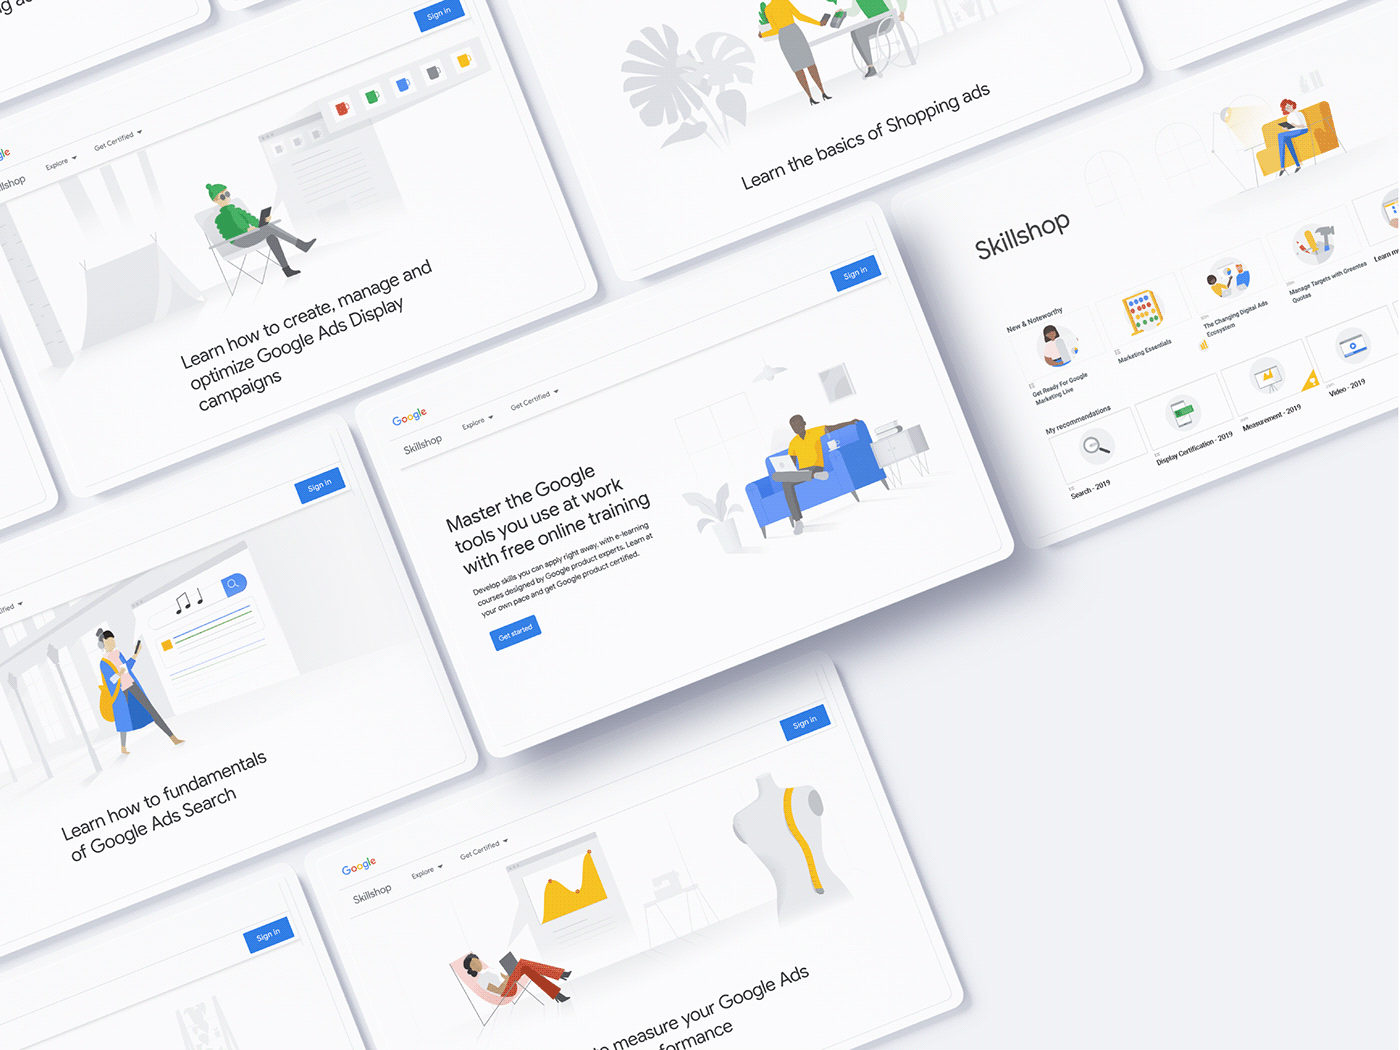 Character design  corporate google guidelines iconography ILLUSTRATION  marketing   Skillshop styleguide tech